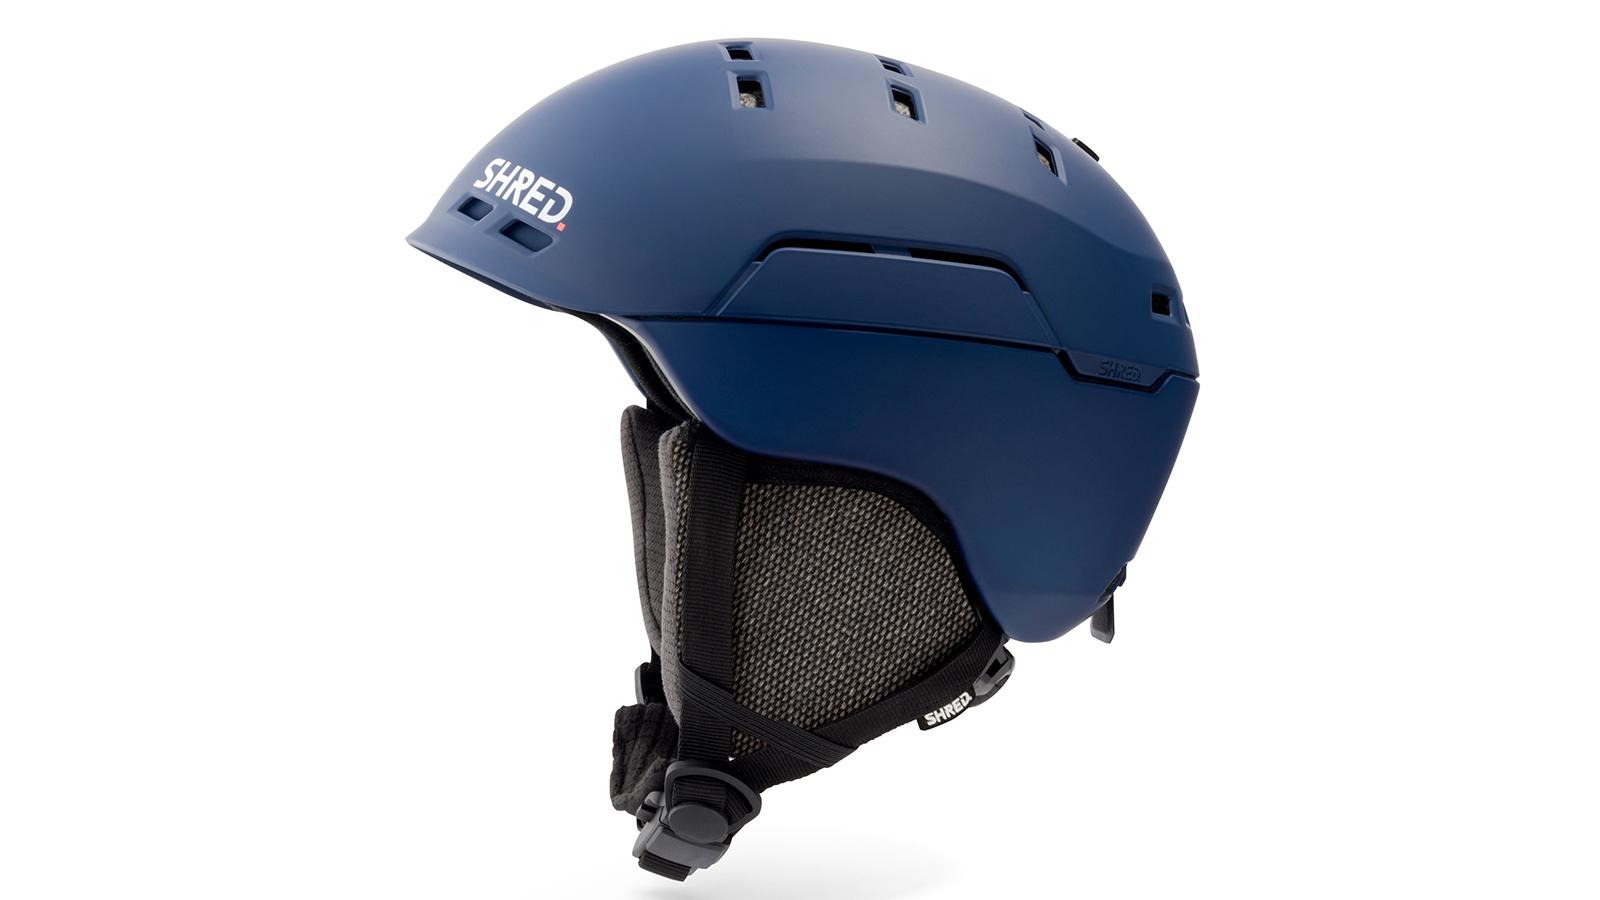 Shred FW20/21 Snow Helmets